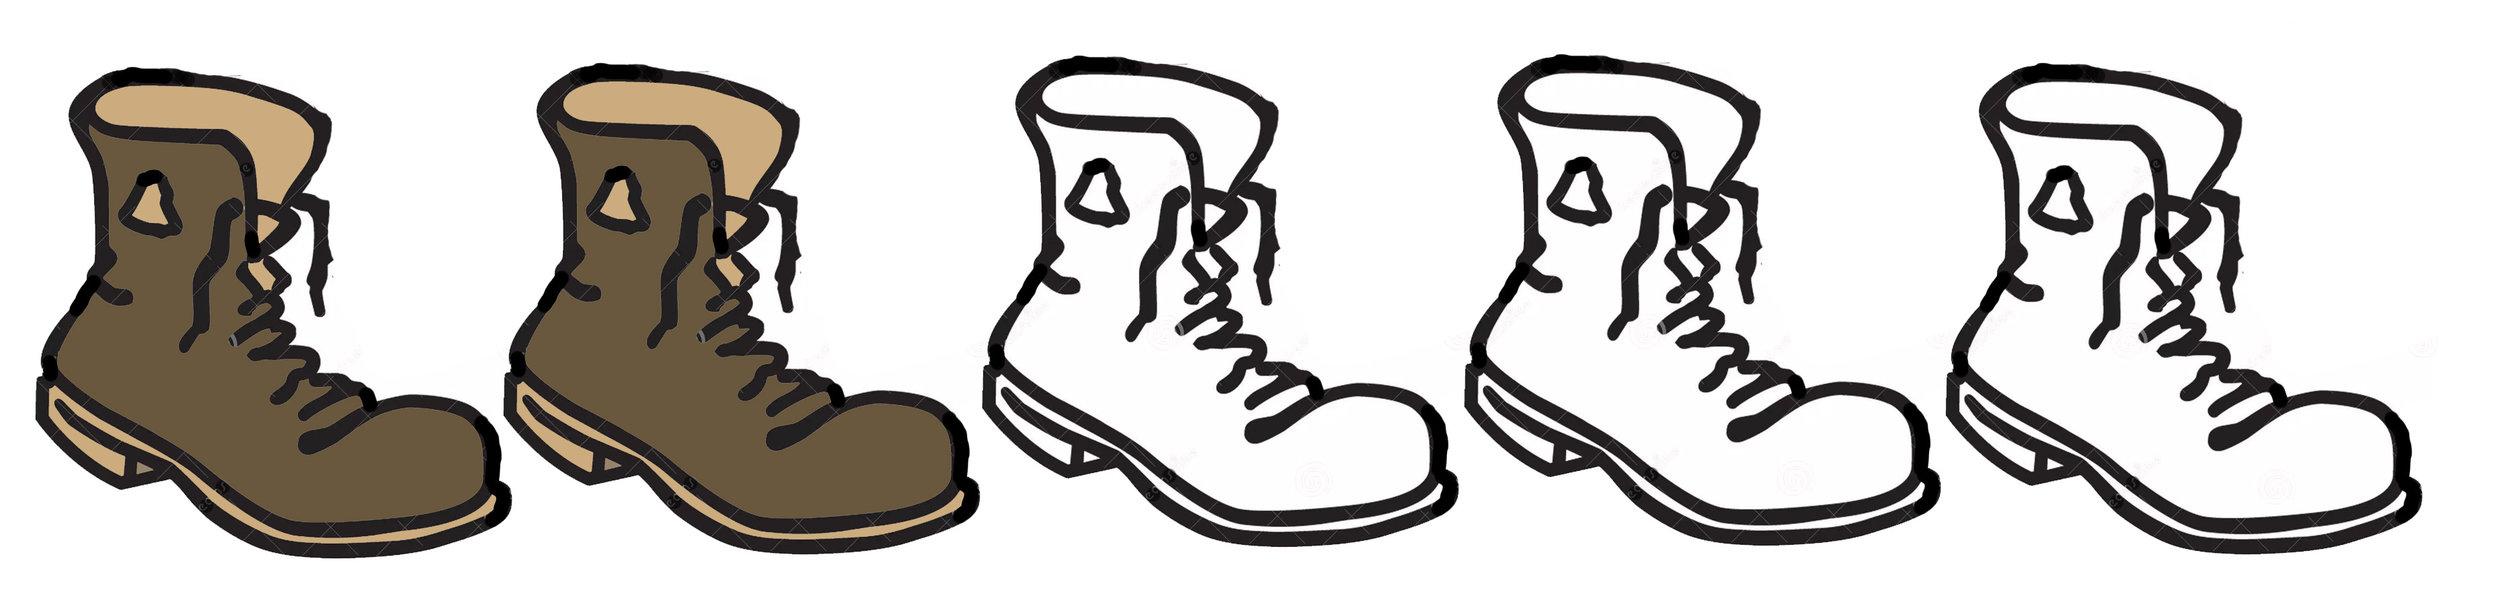 2 boot.jpg